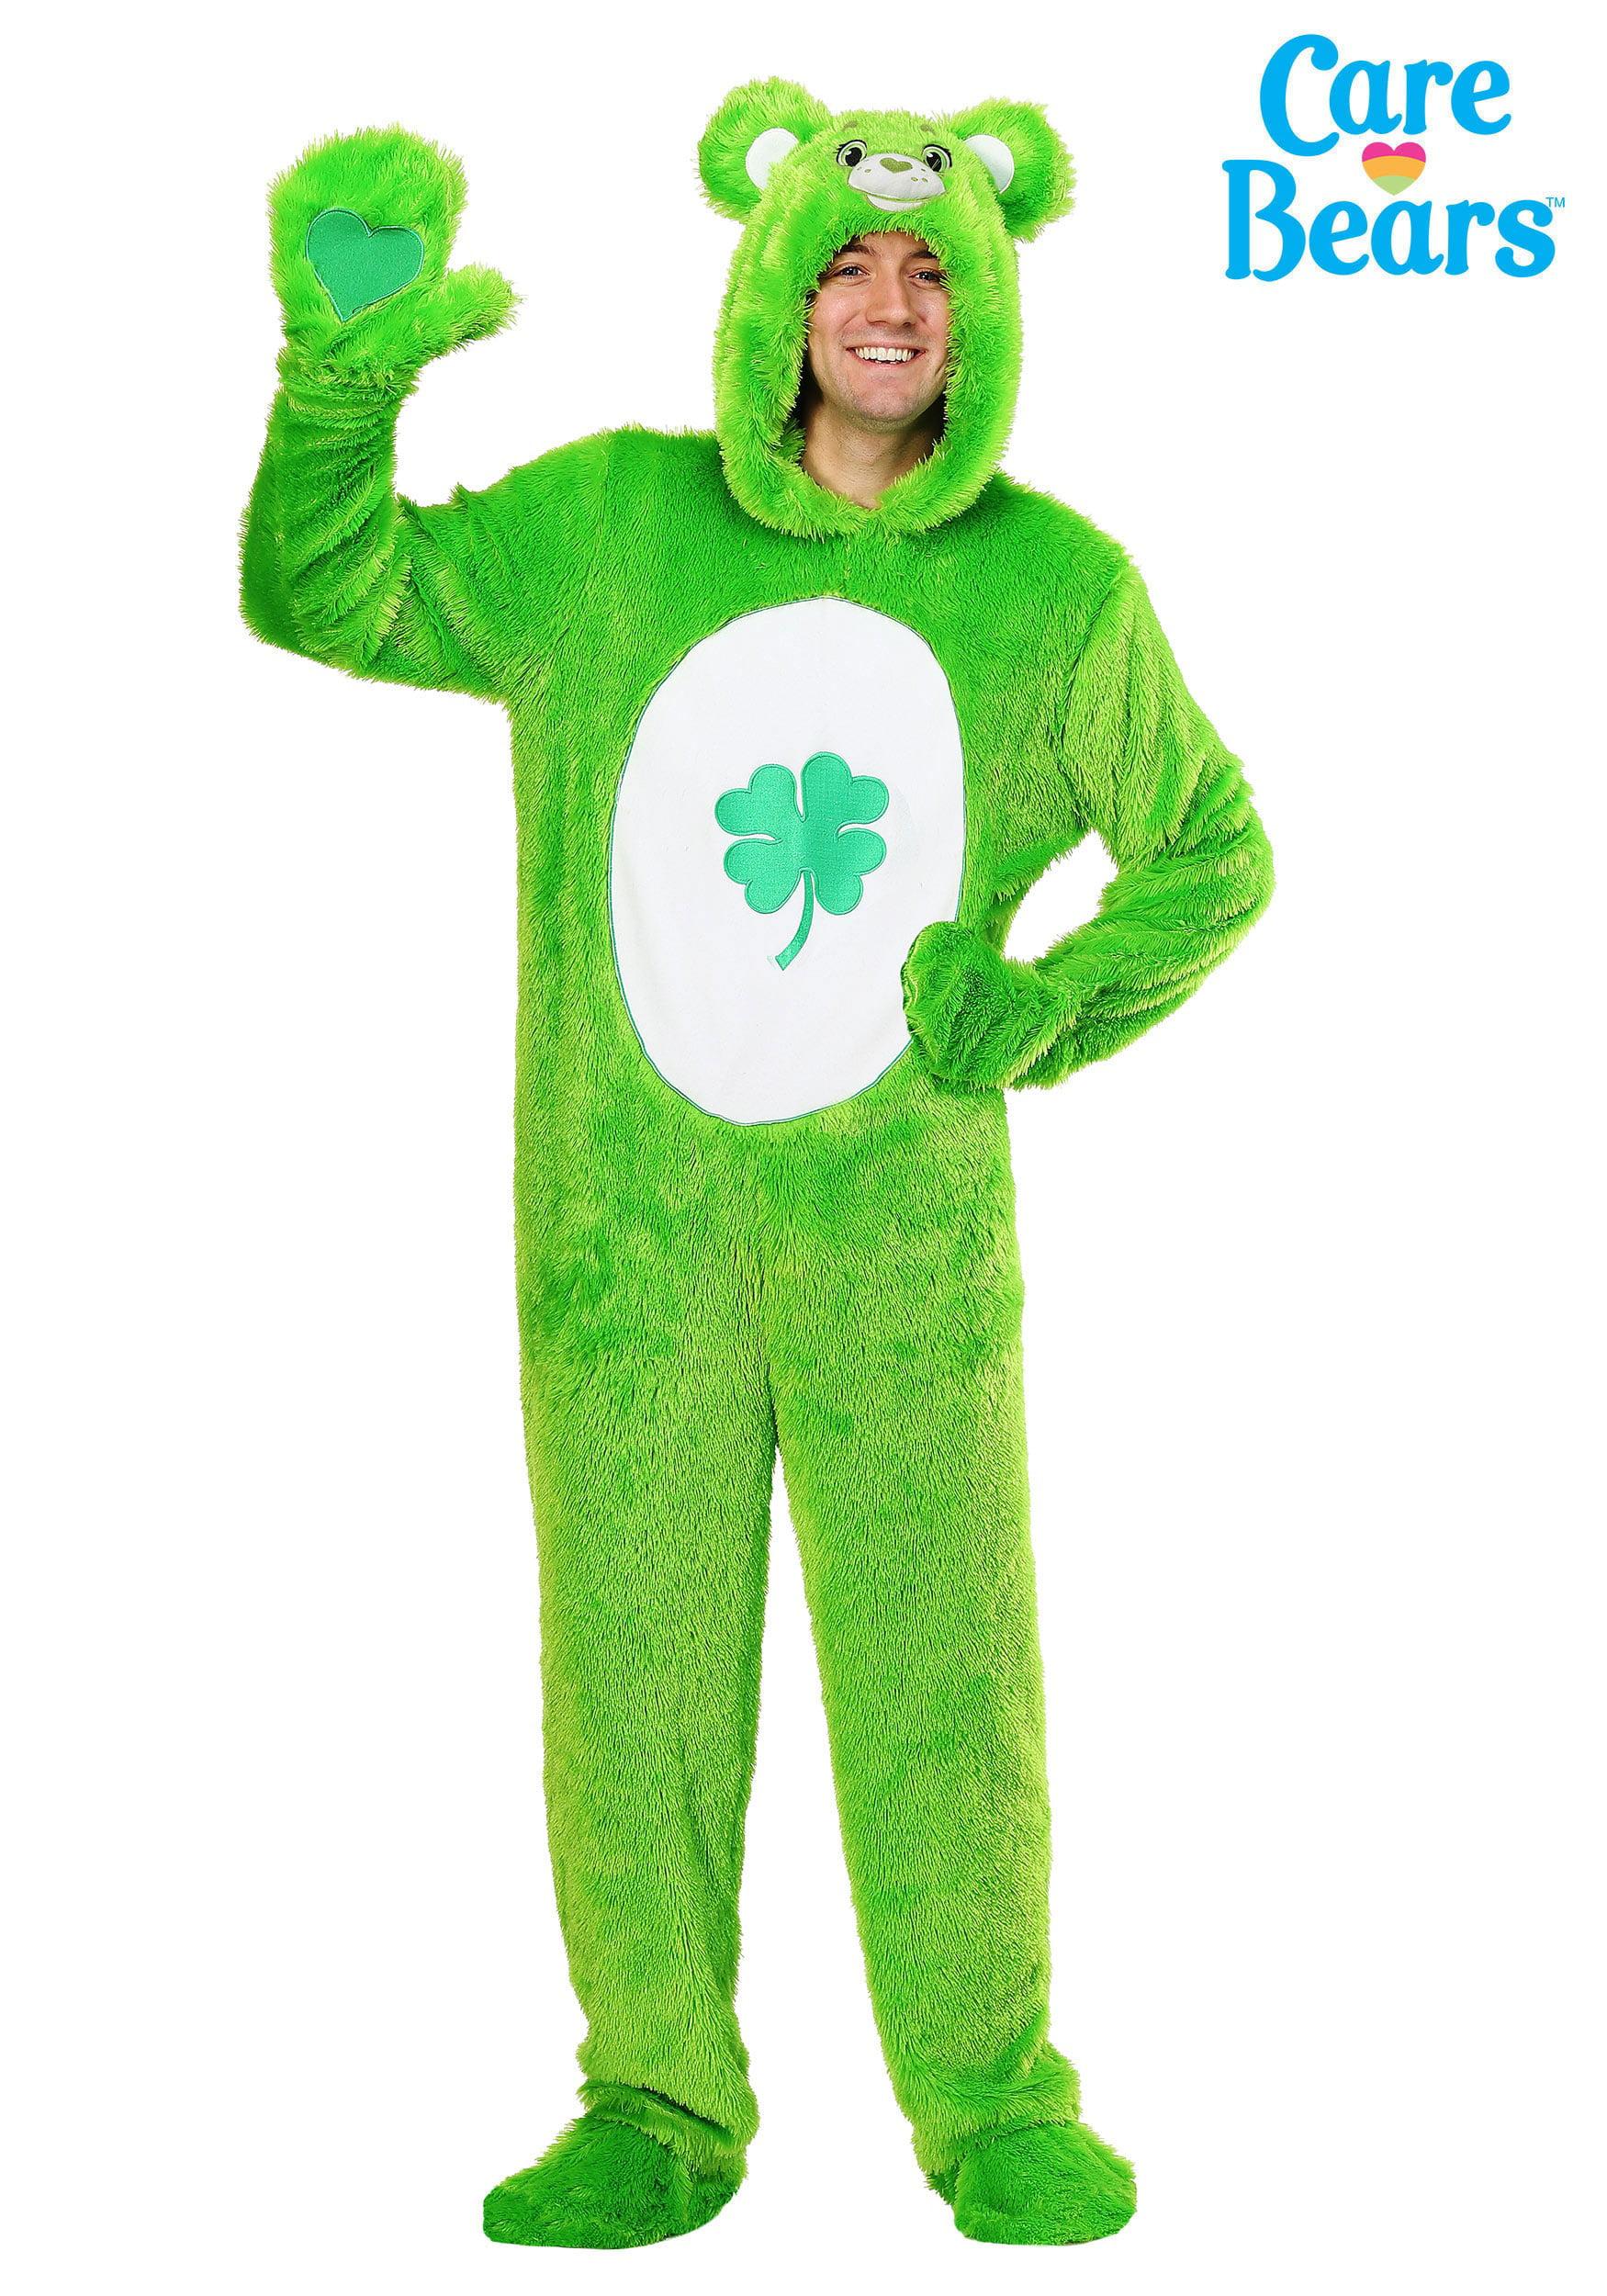 bear Adult costume care